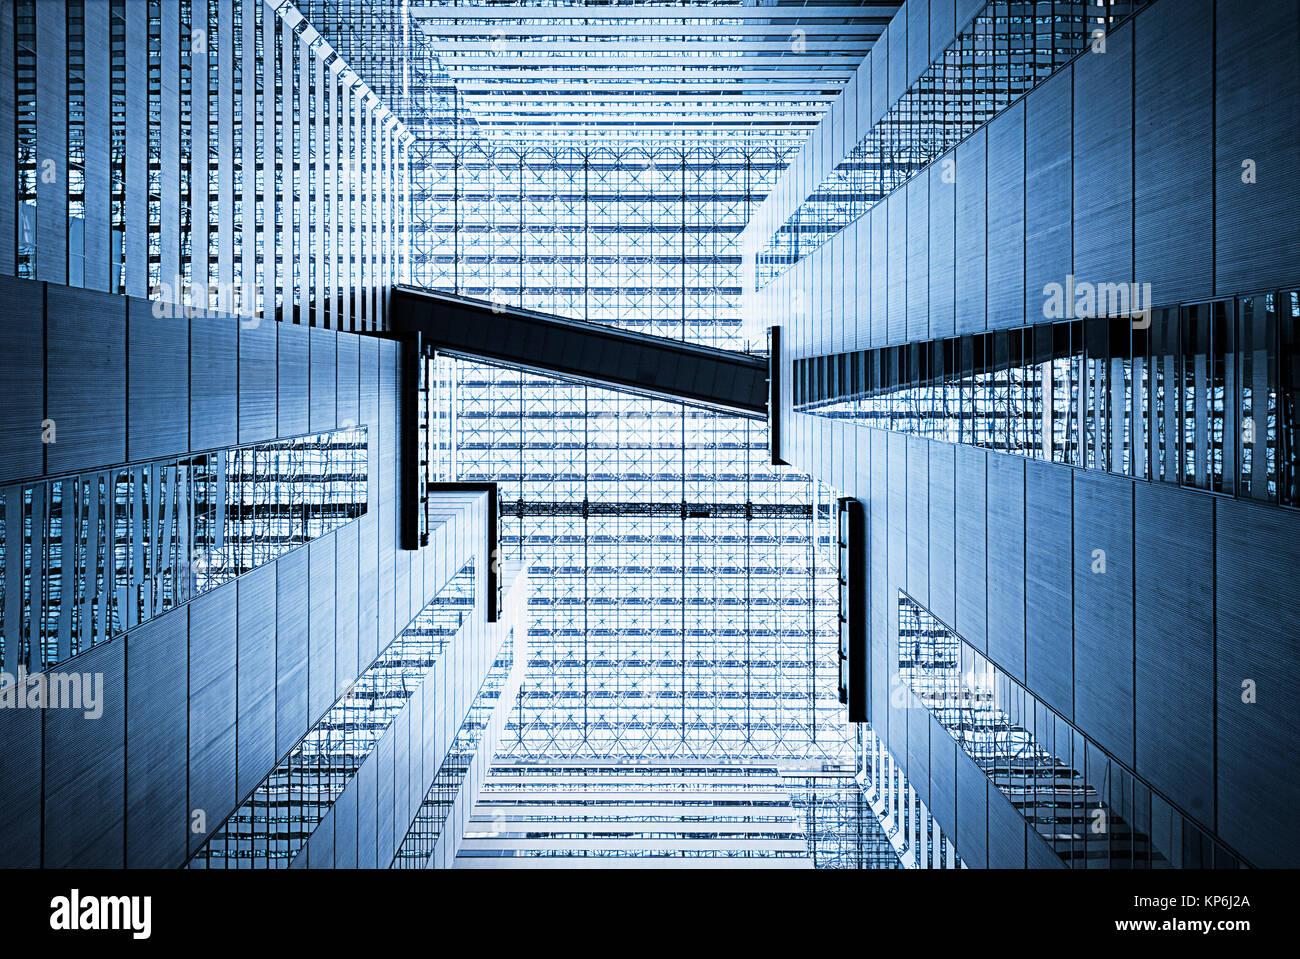 Abstract Architecture Atrium - Stock Image